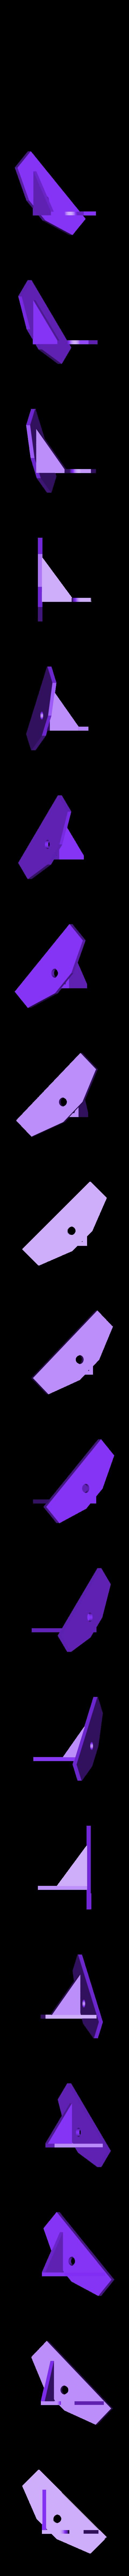 Train_Indicator_Bracket_Left.STL Download free STL file 4-8-8-4 Big Boy Locomotive • 3D printer object, RaymondDeLuca